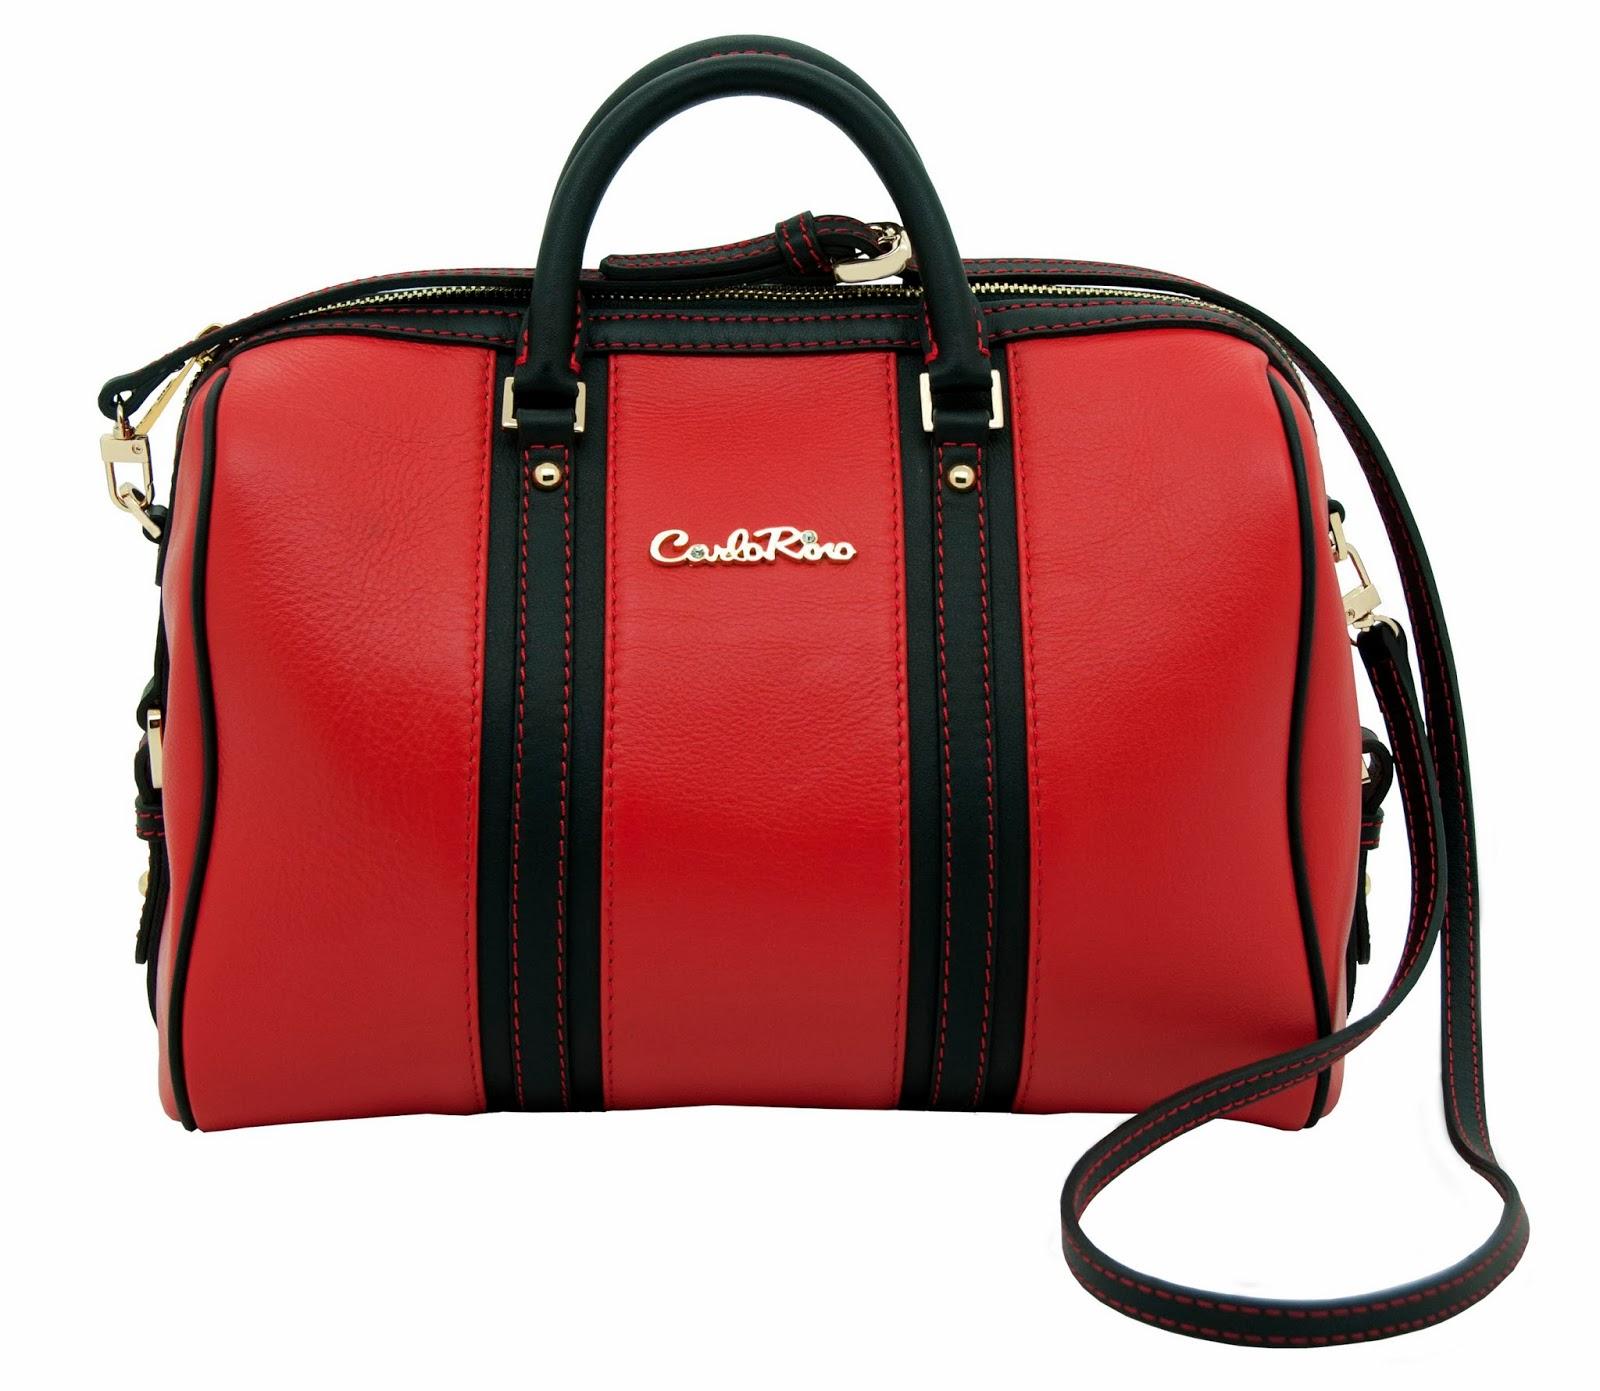 Bonia Handbags Catalogue Handbag Collections